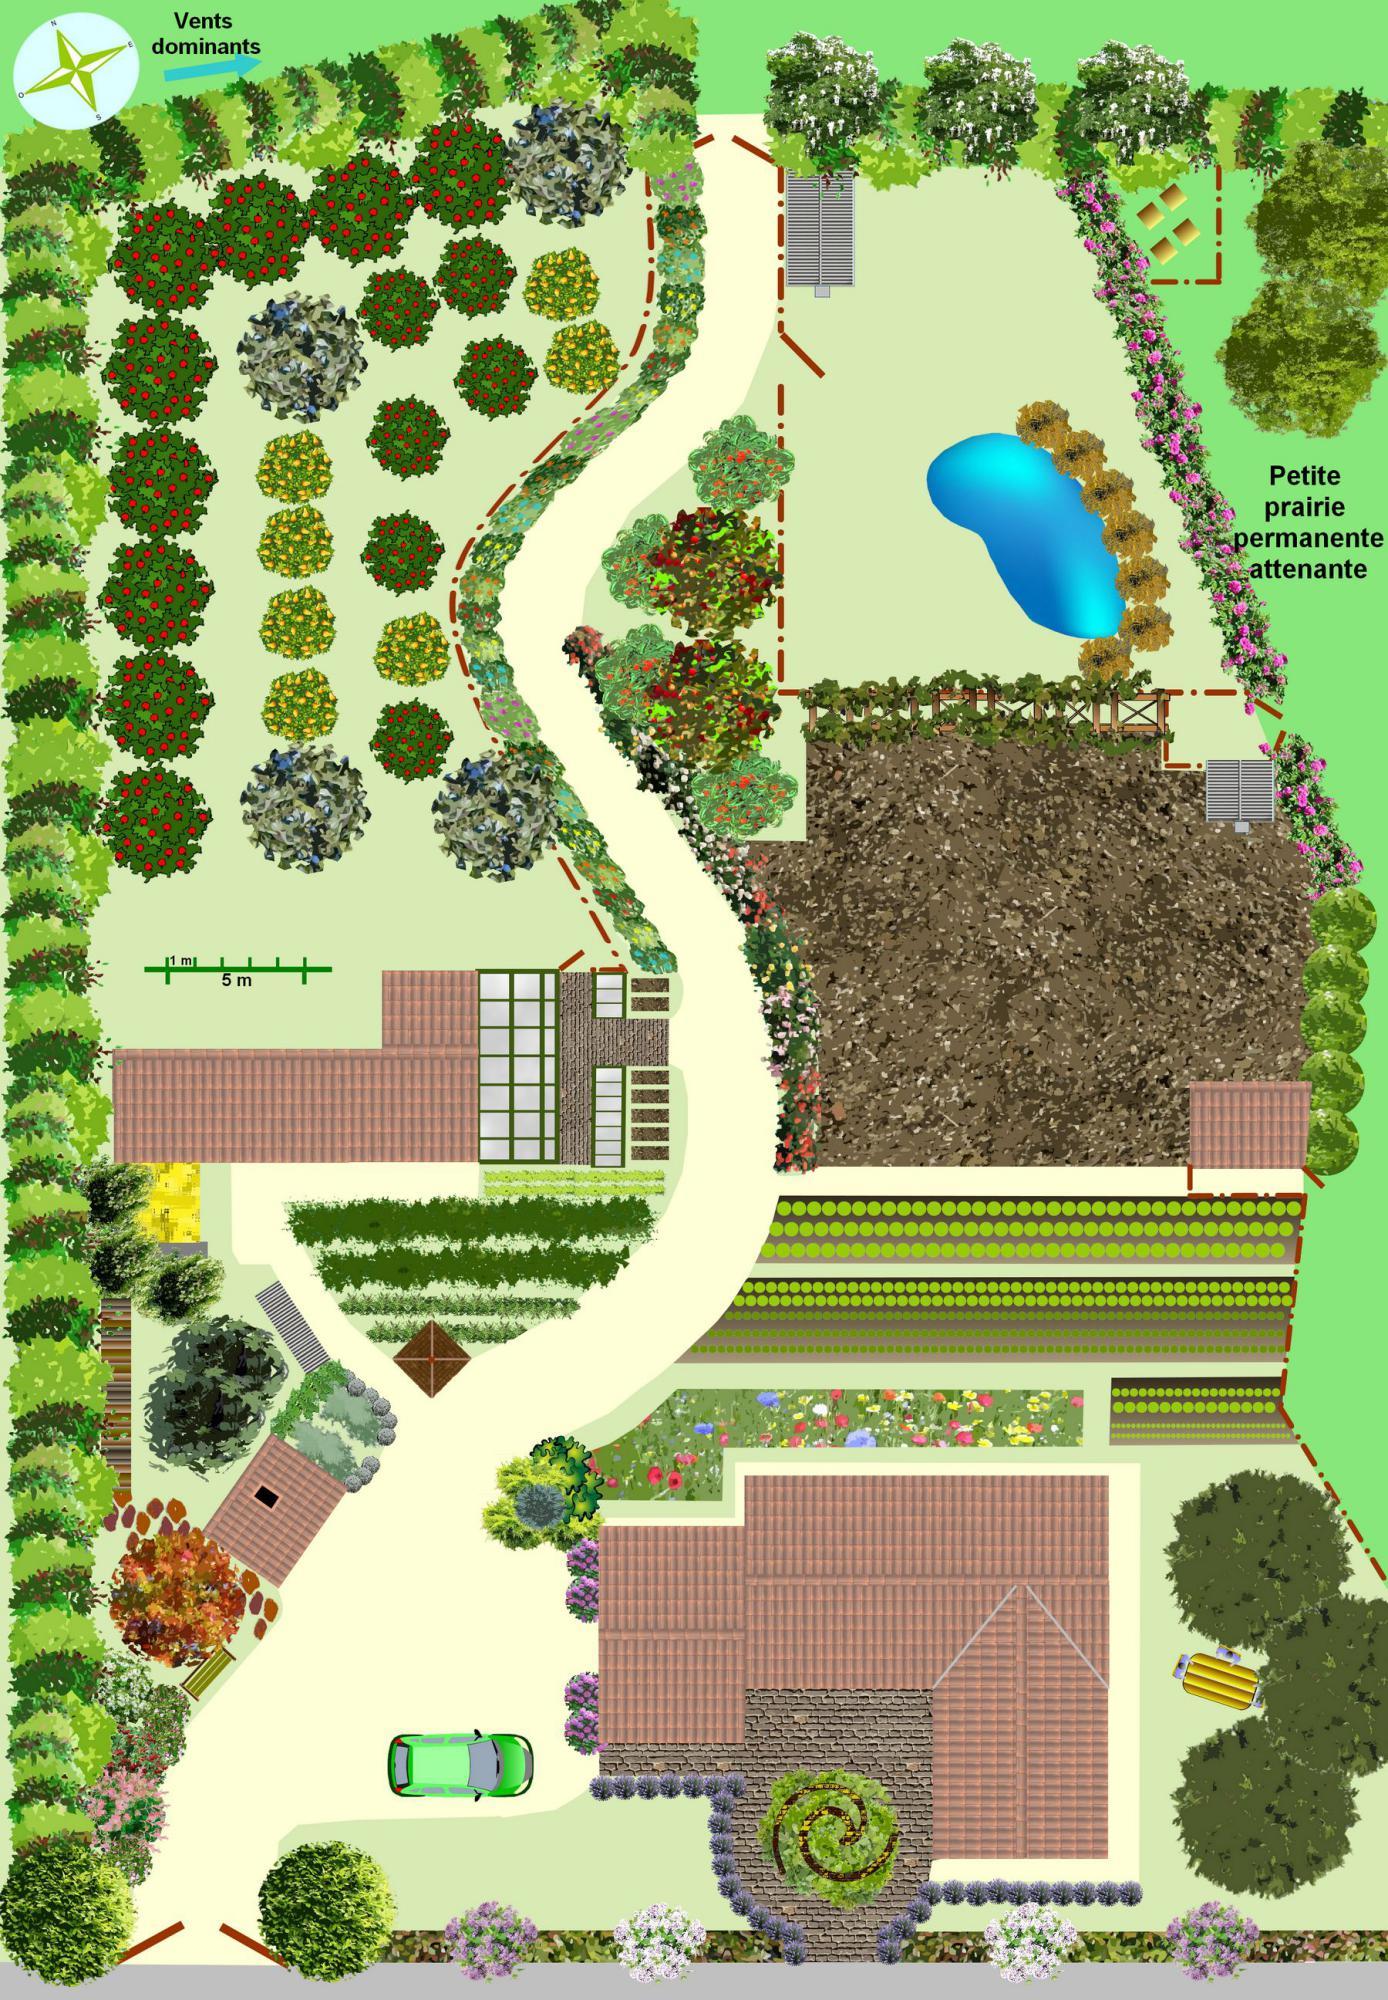 plan dun jardin en permaculture - Jardin Permaculture